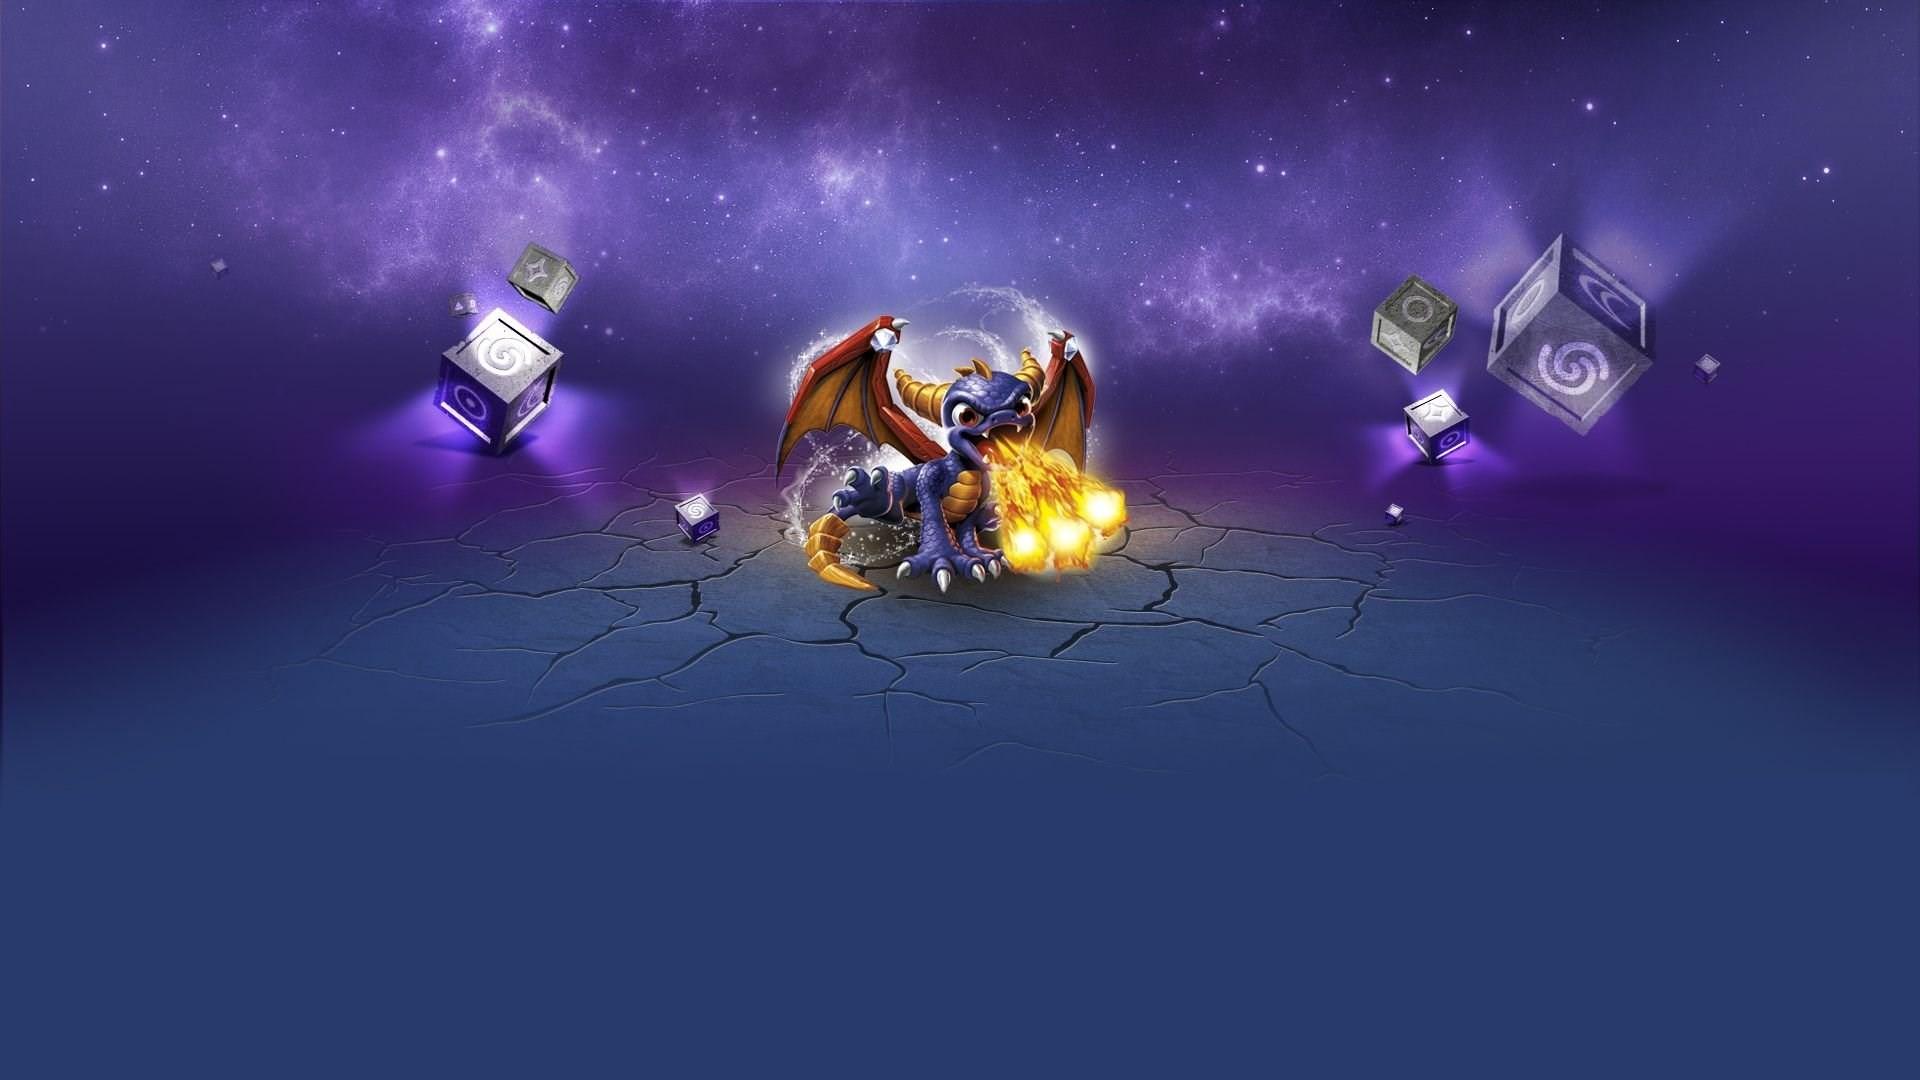 Spyro The Dragon Wallpaper Wallpapertag